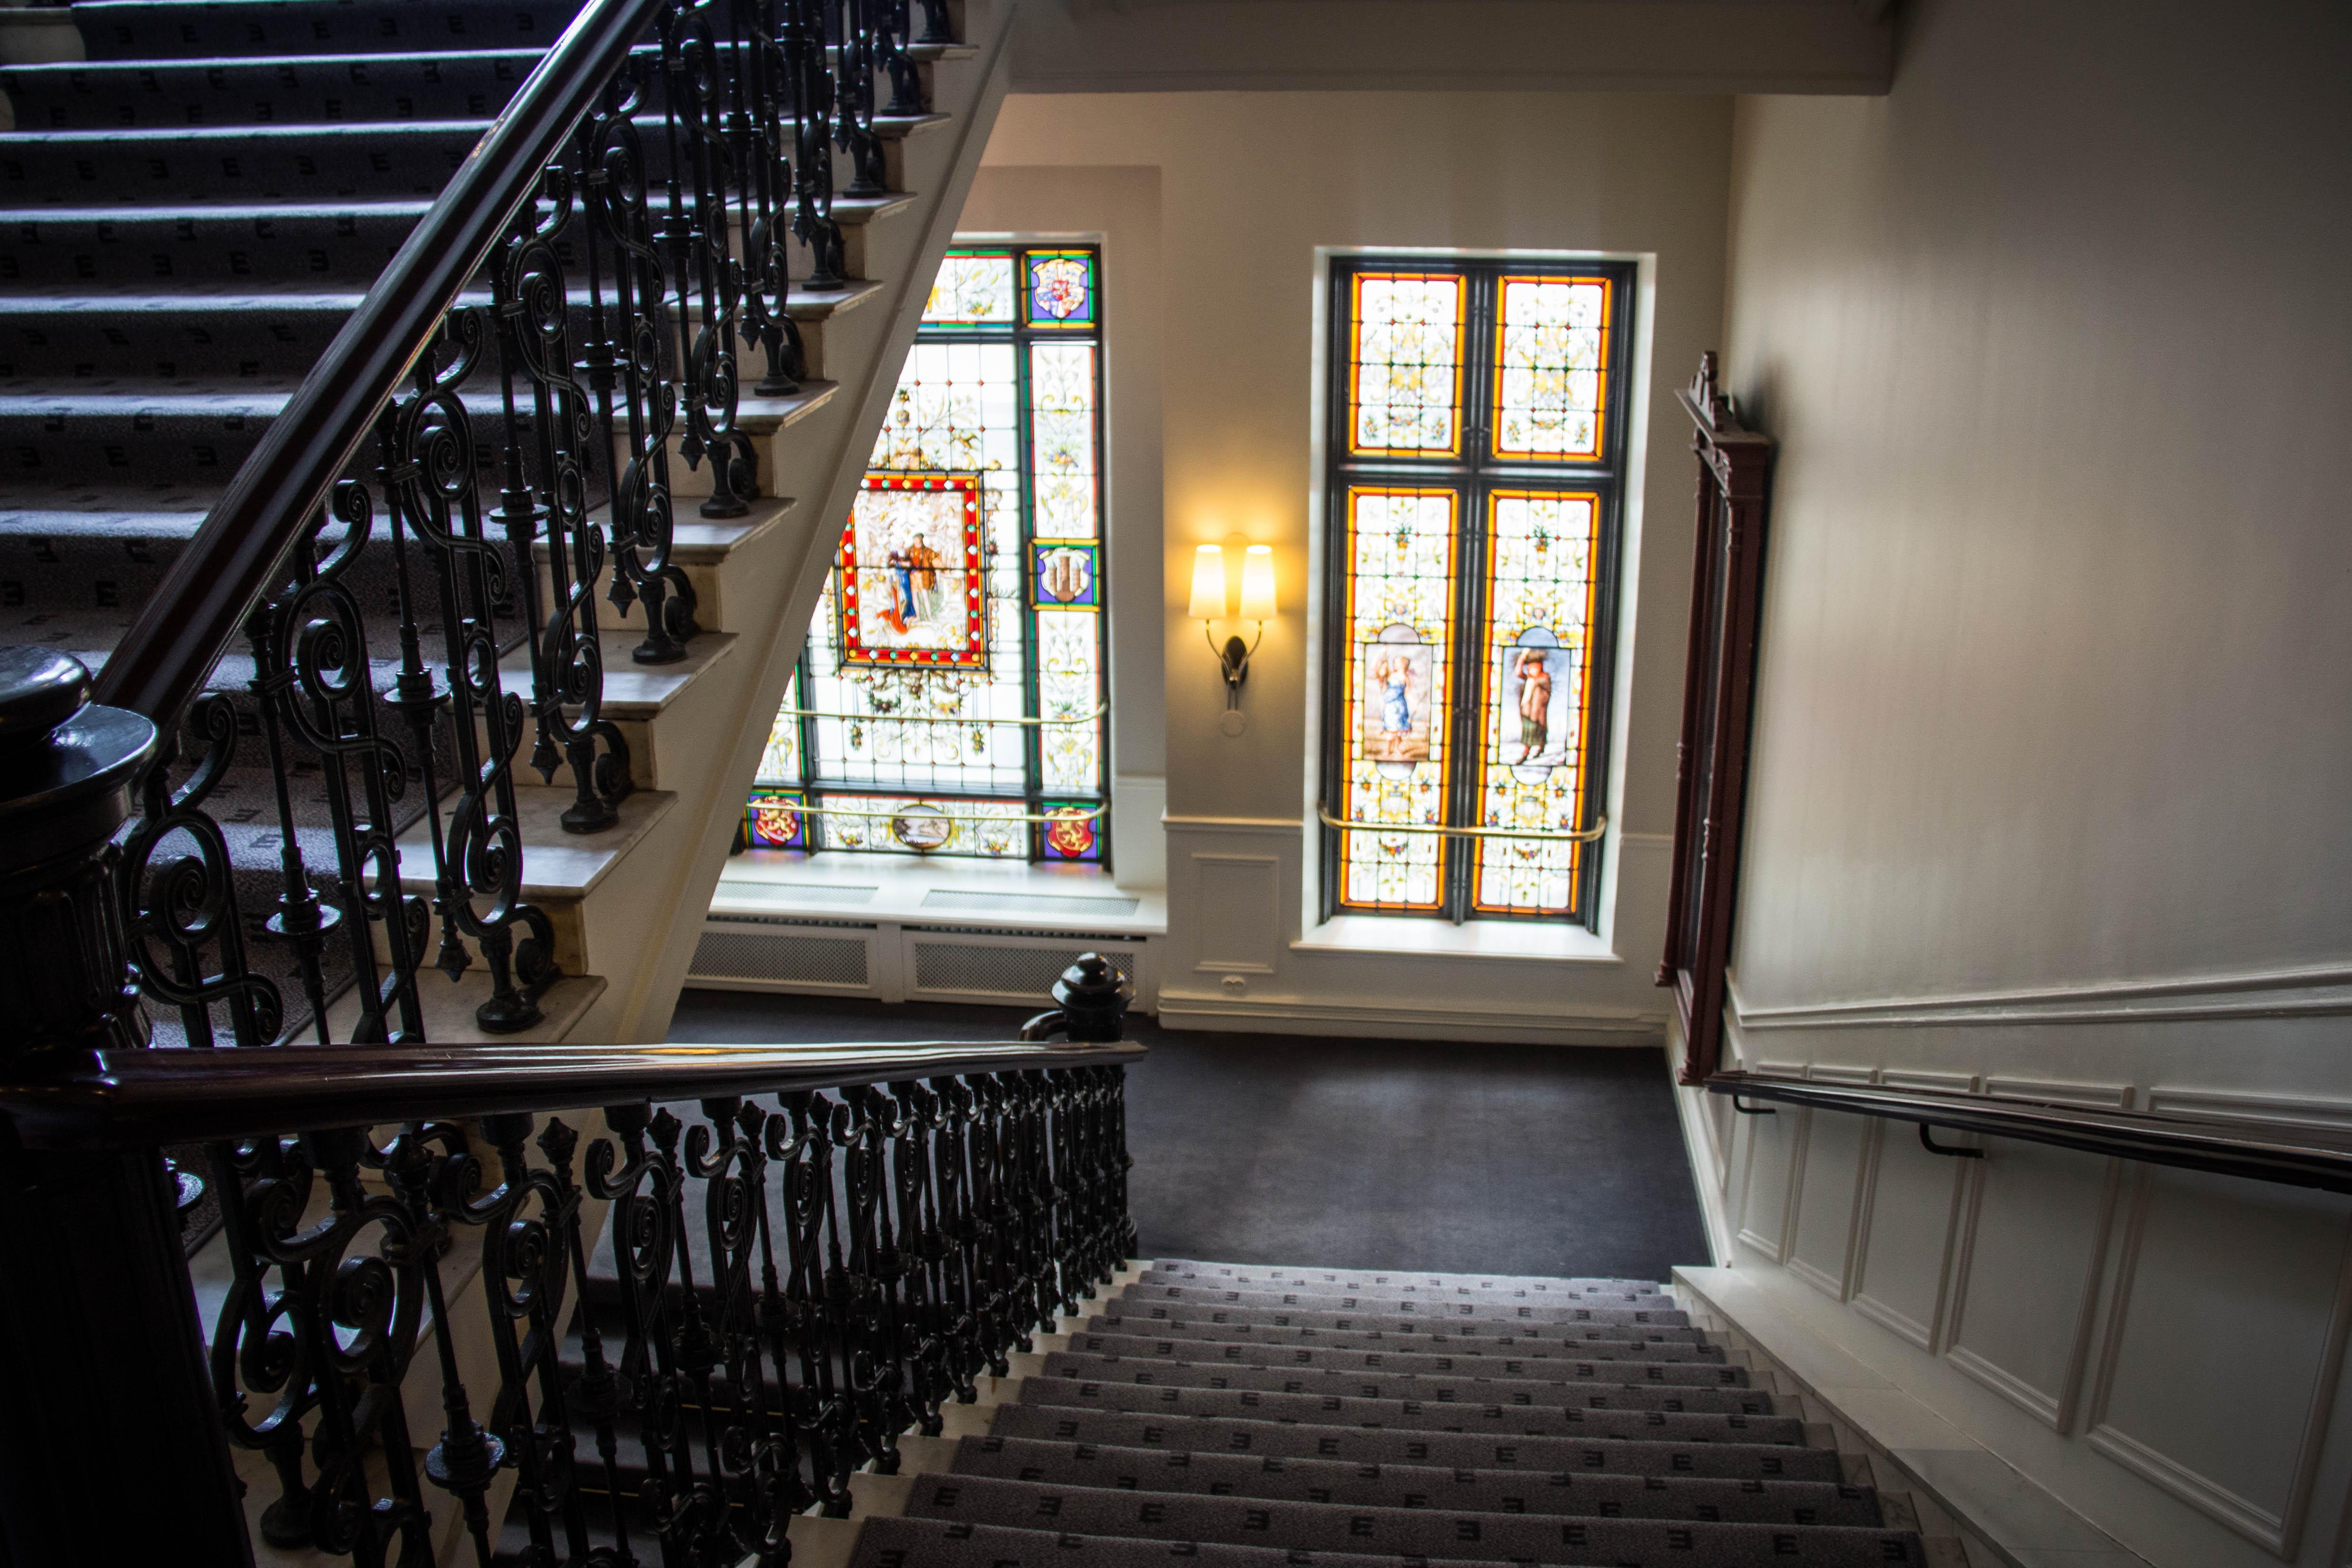 Fondos de pantalla arquitectura edificio biblioteca for Diseno de iluminacion de interiores